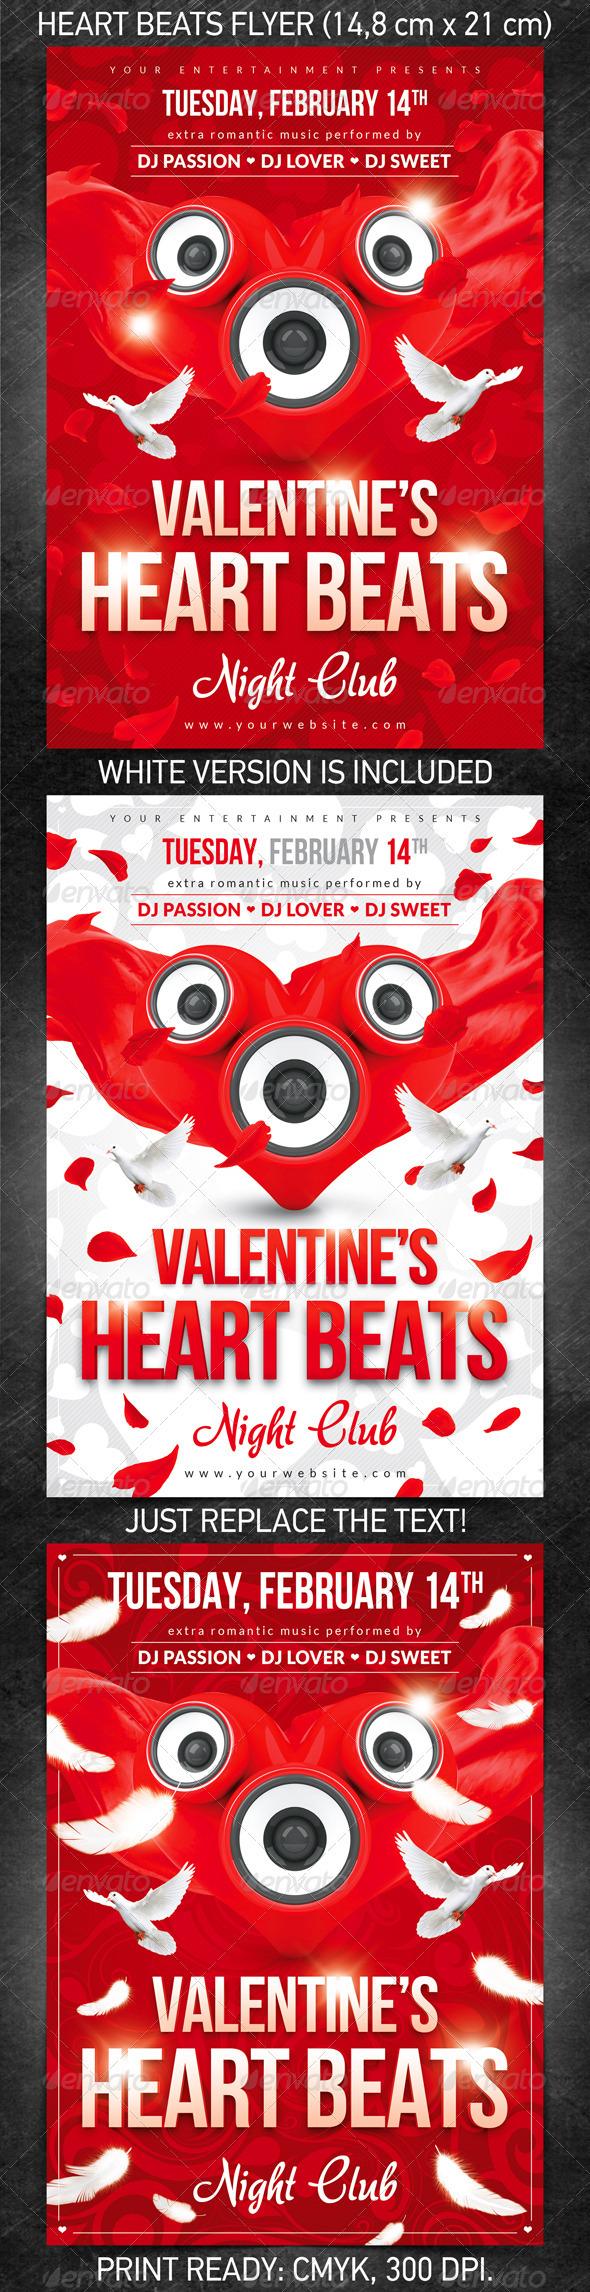 GraphicRiver Heart Beats Flyer 1367563